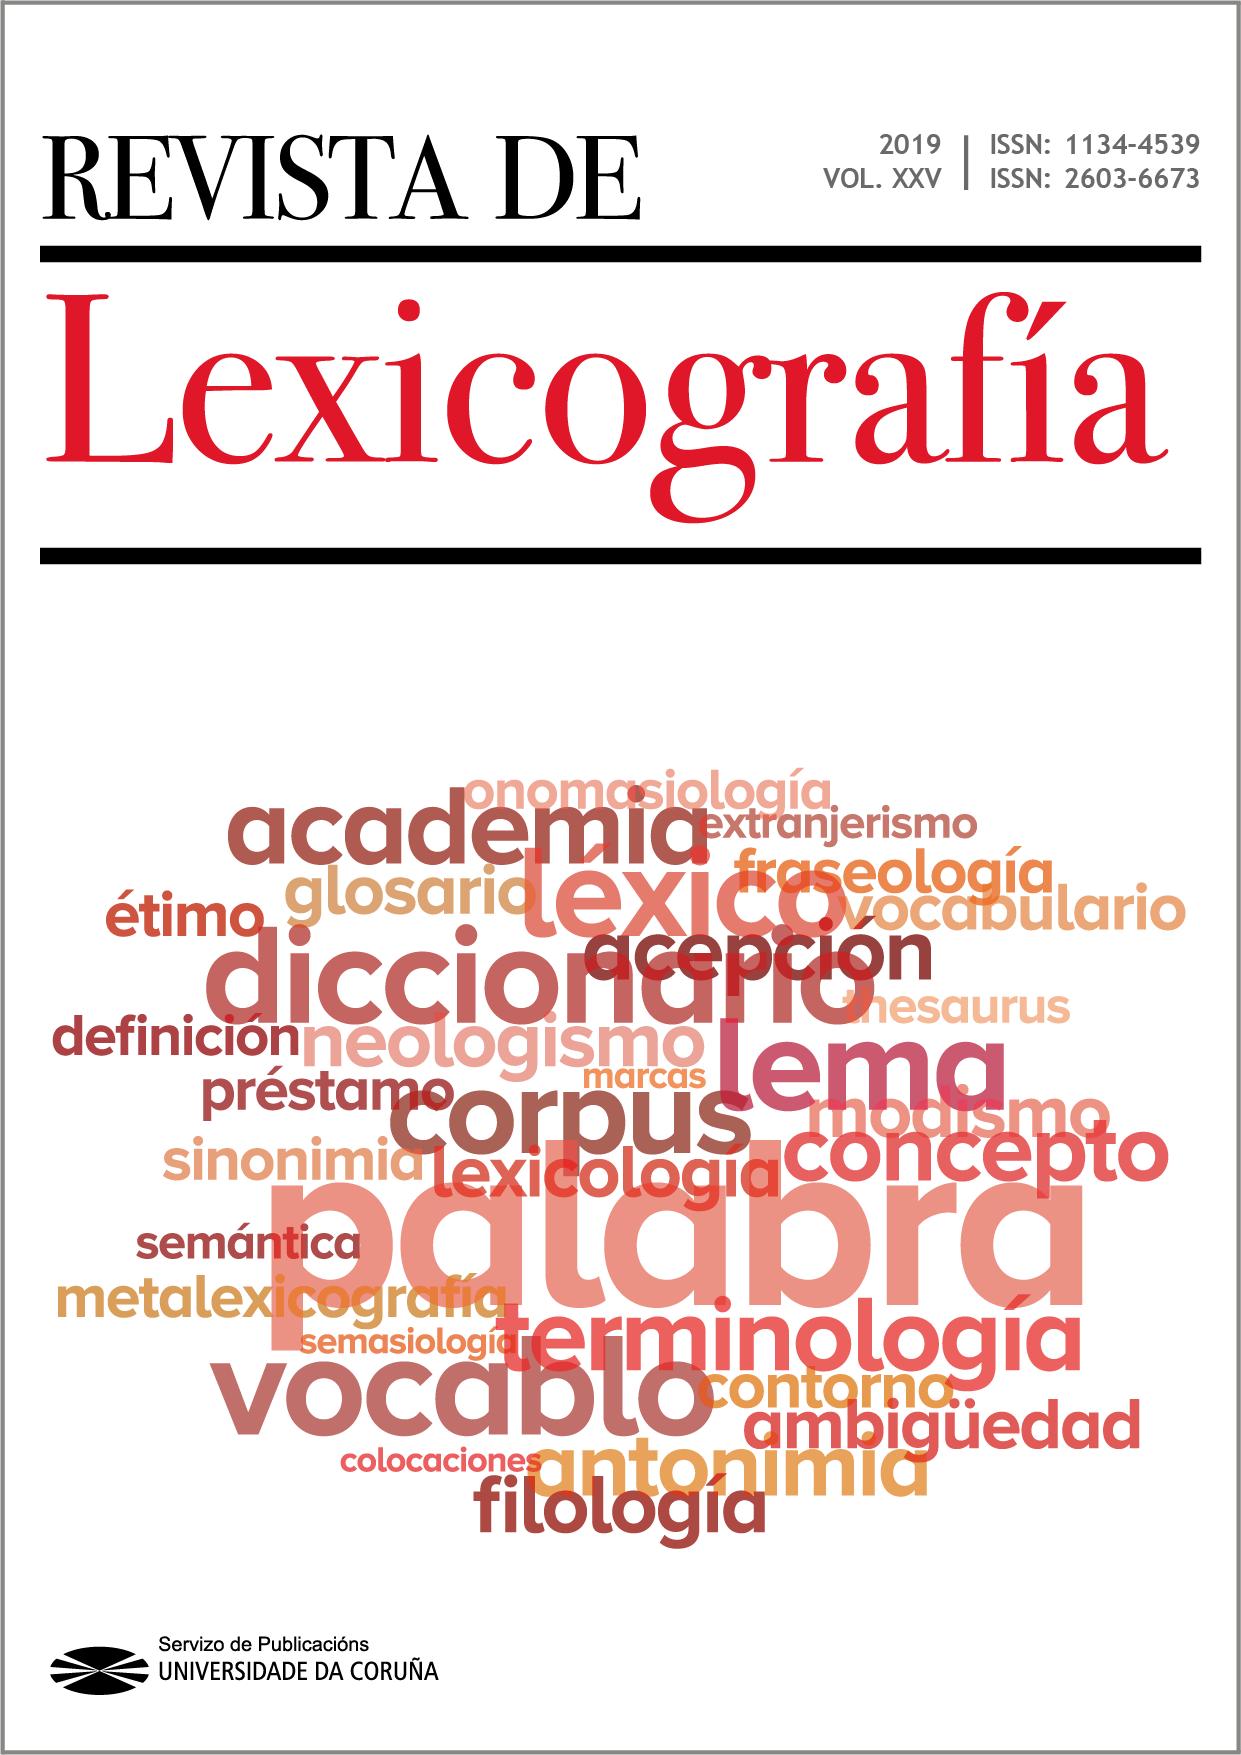 Portada de la Revista de Lexicografía 2019